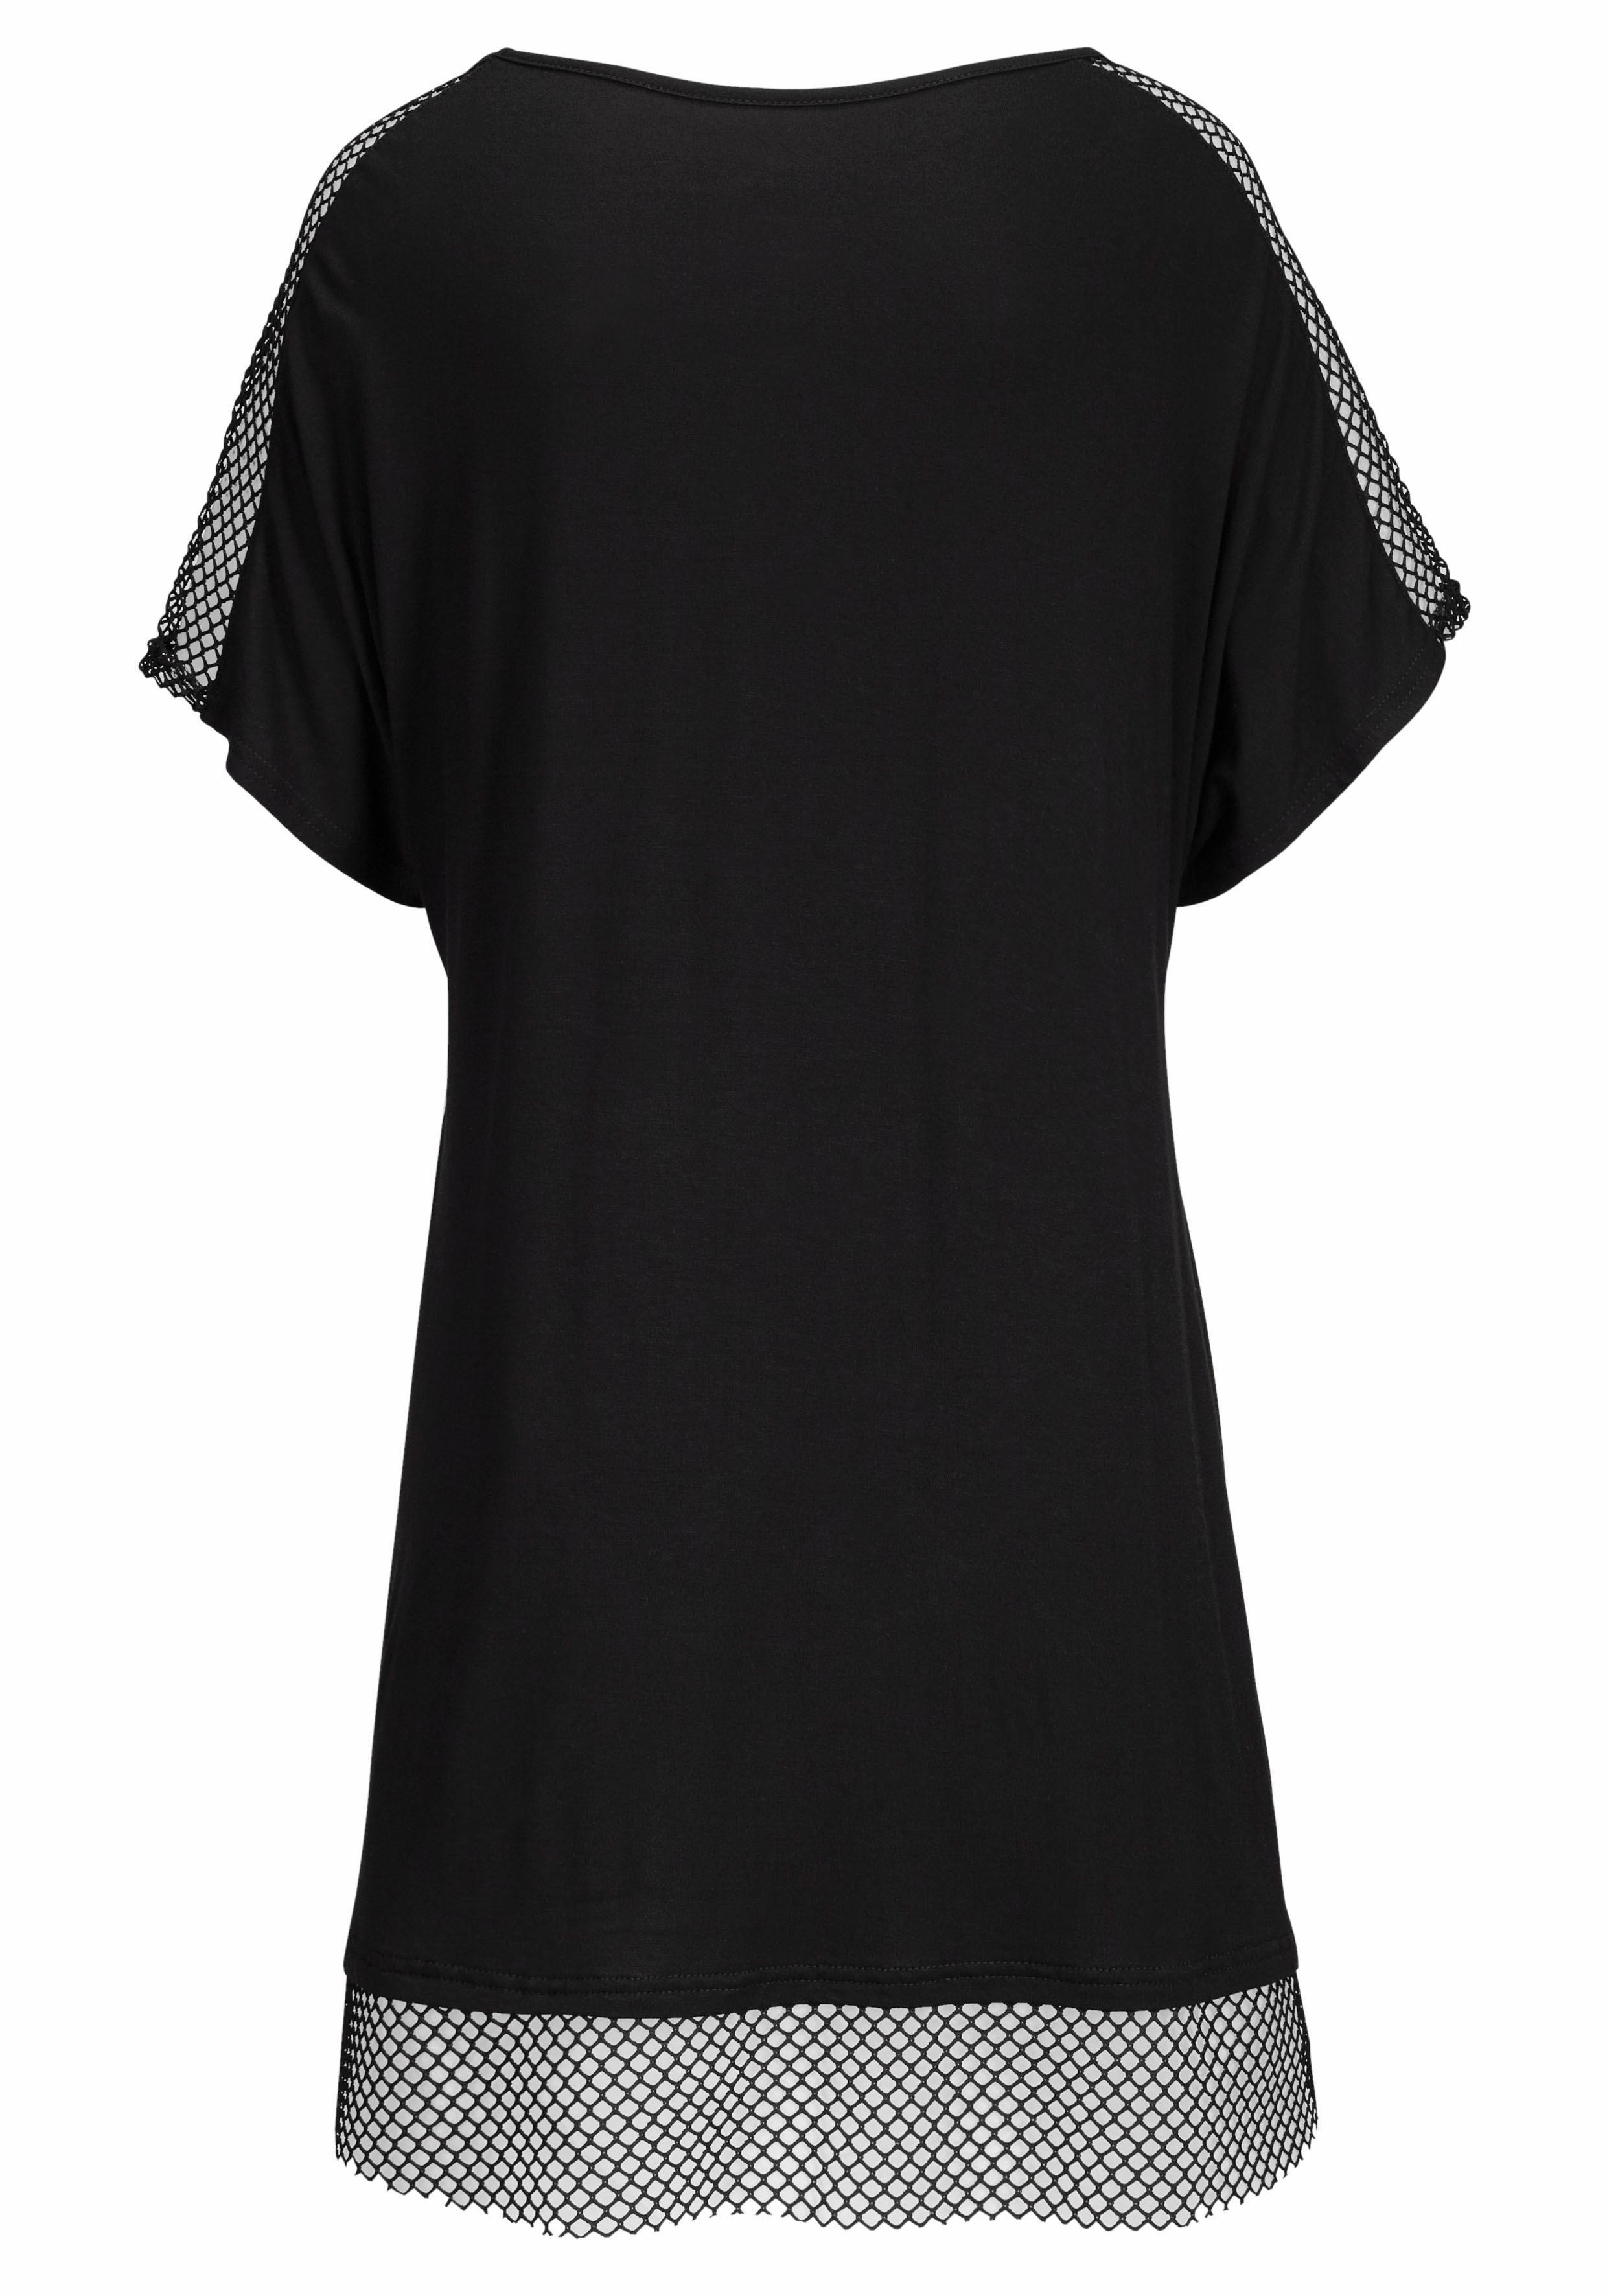 Label S Gekocht Red Beachwear Lang Shirt oliver Online Snel zMSVqGUp